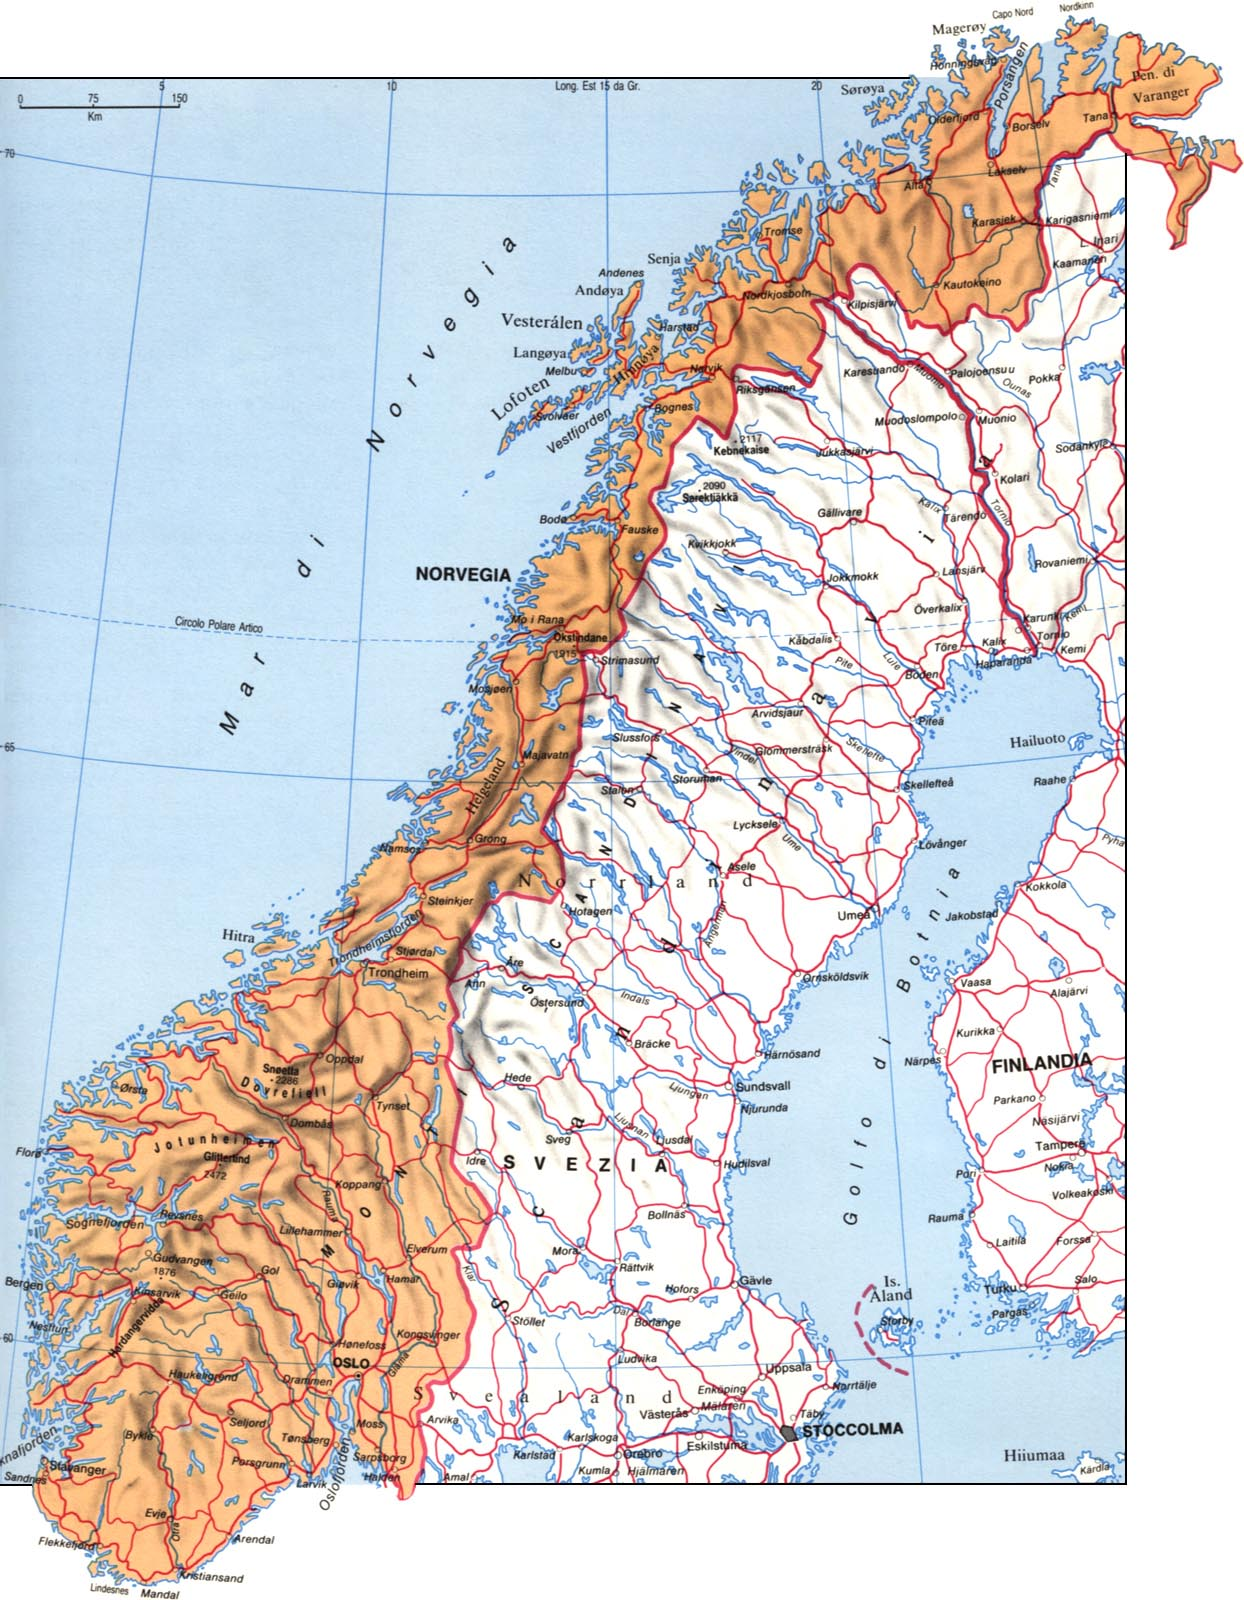 Cartina della Norvegia